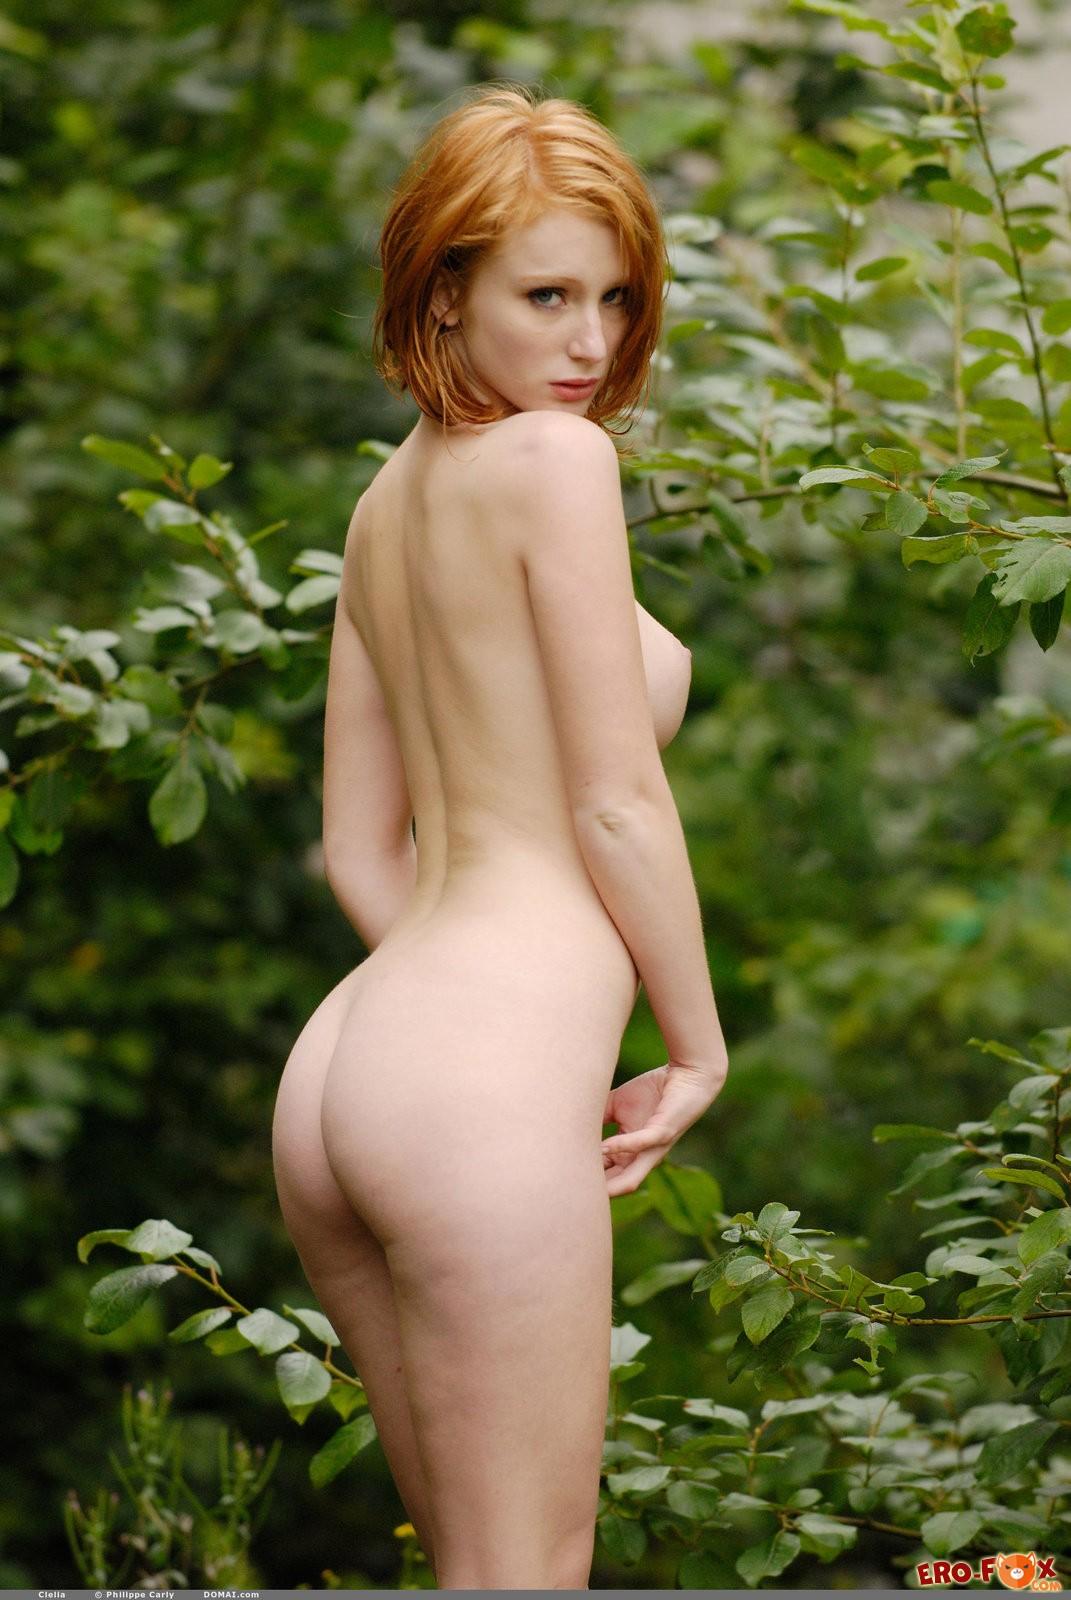 Голая рыжая француженка с волосатым лобком